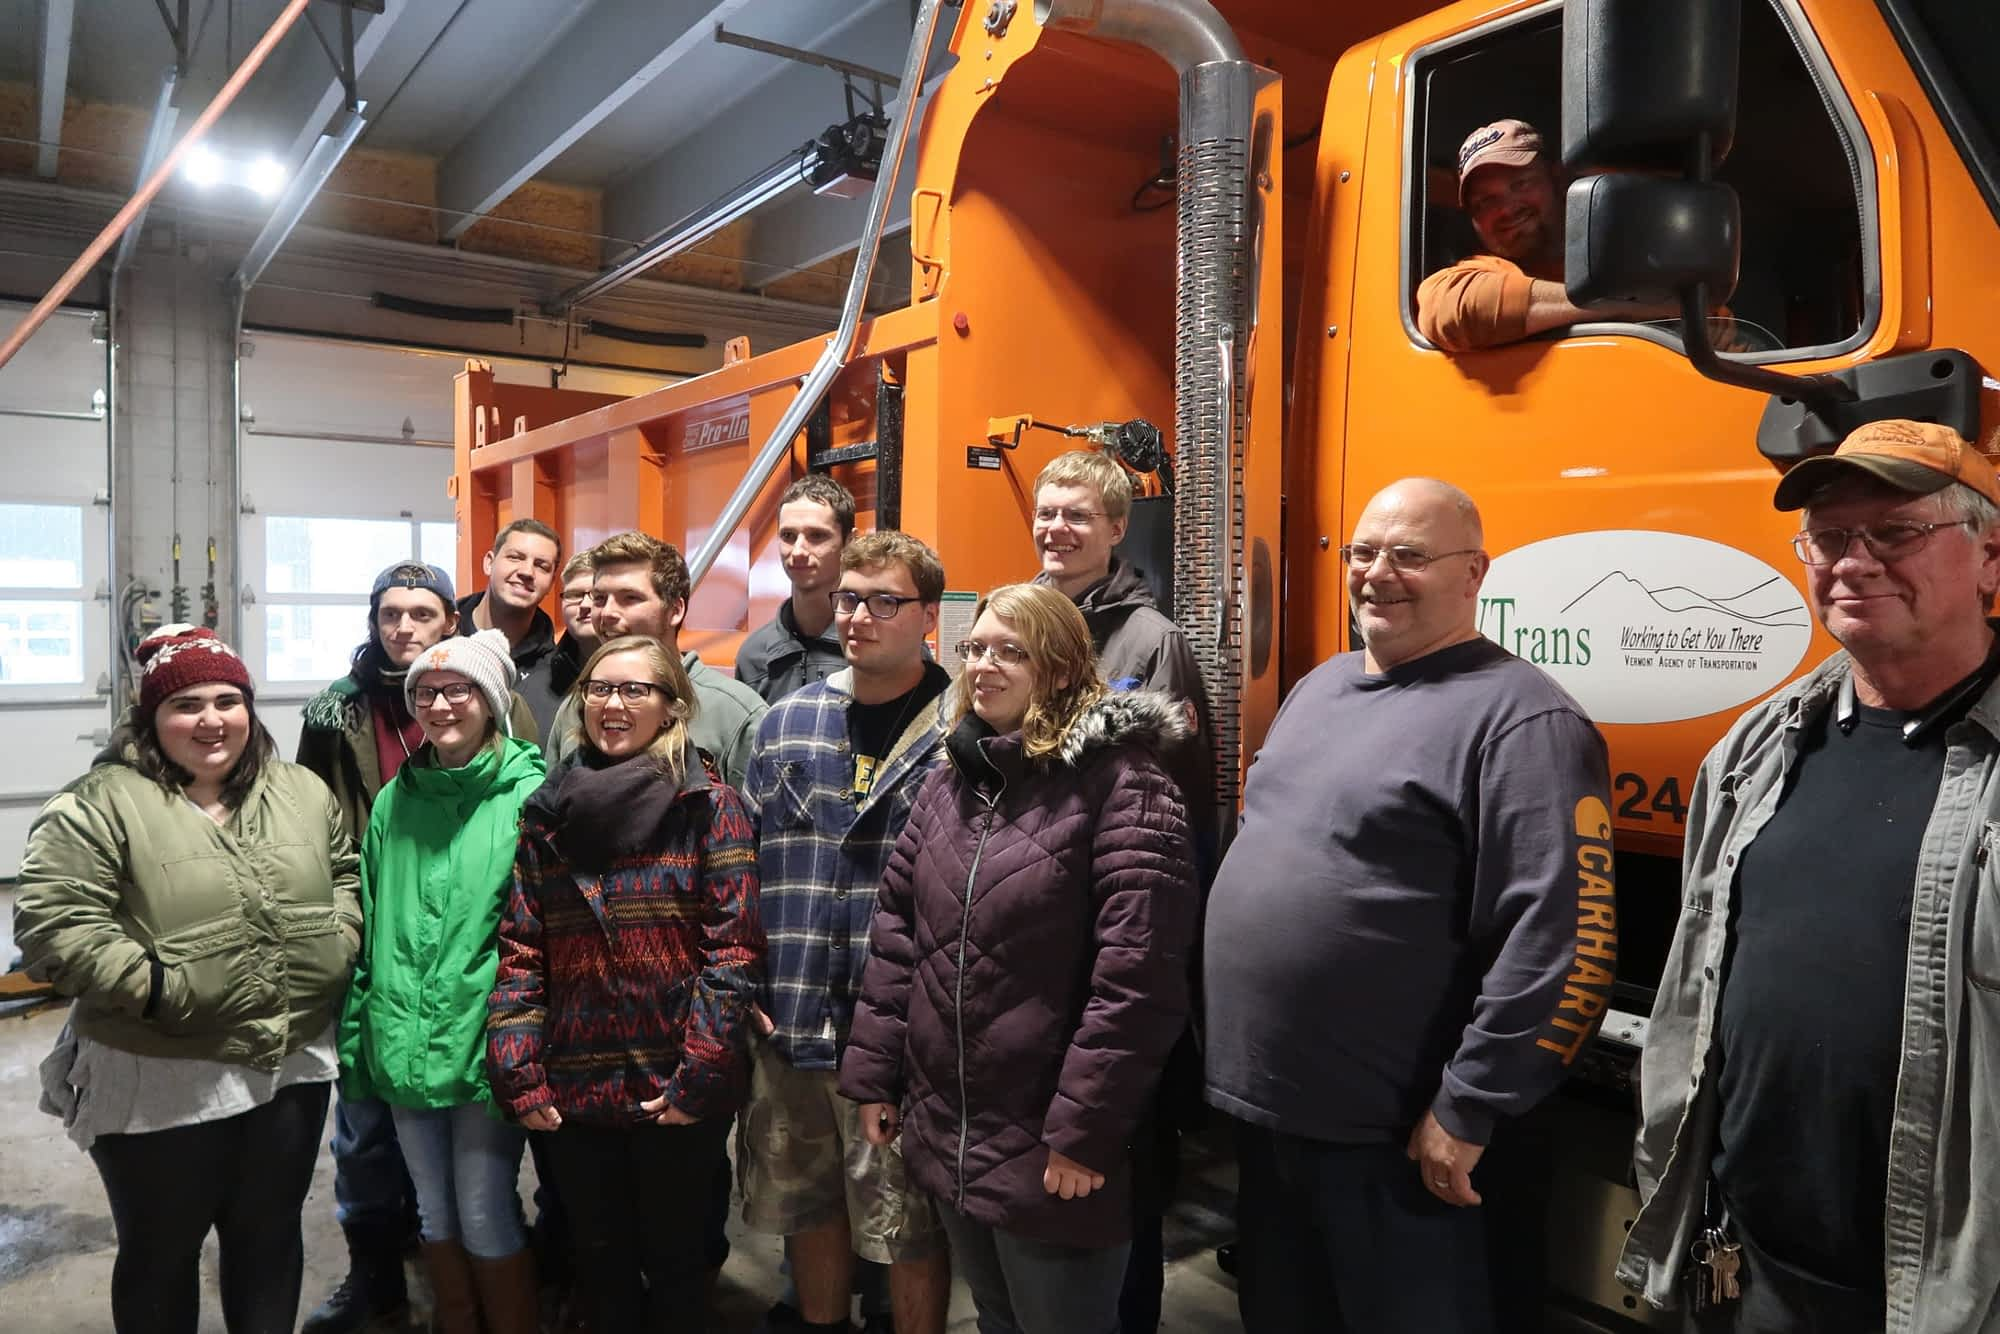 Students visit the Lyndonville VTrans garage on November 18, 2019